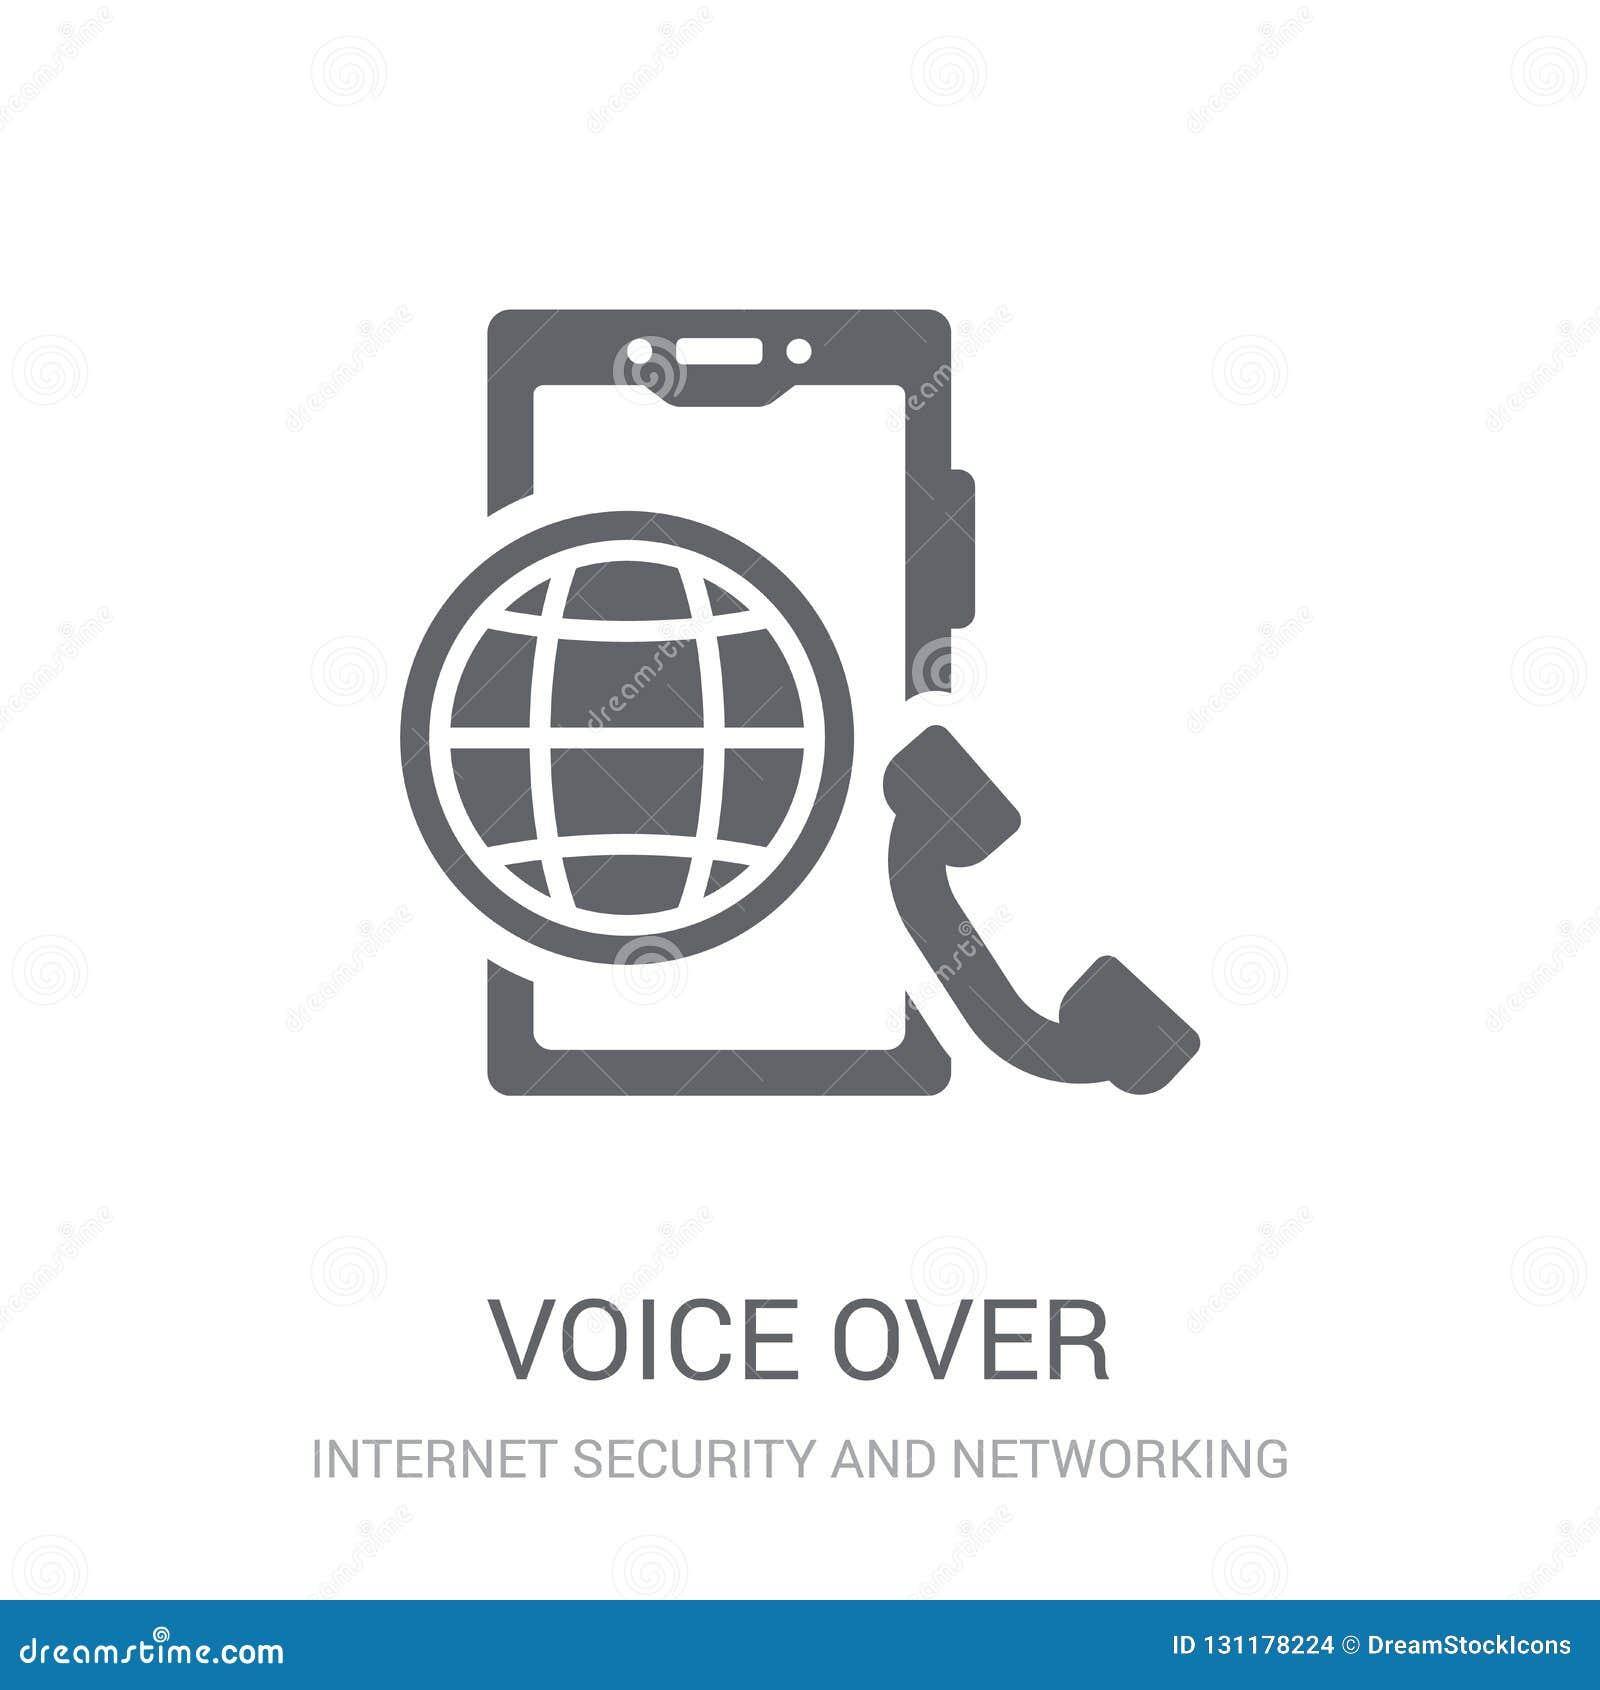 Voz sobre icono del Internet Protocol